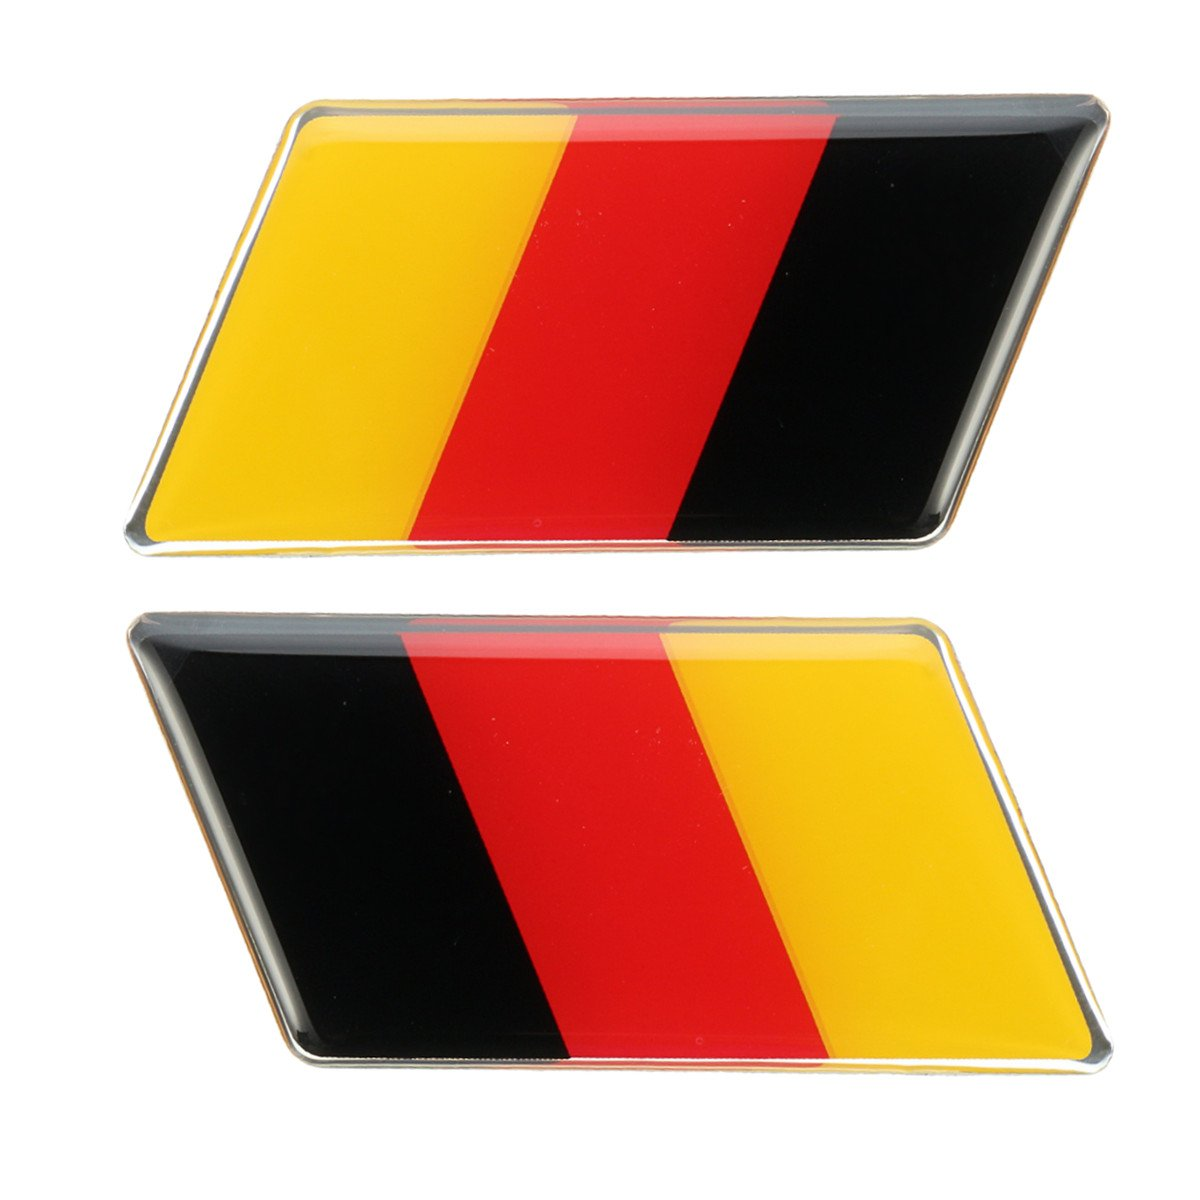 MONNY Pair Aluminum Germany Flag Rear Emblem Badge Sticker For Jetta/MK7/MK6/Golf/CC/GTI Waterproof